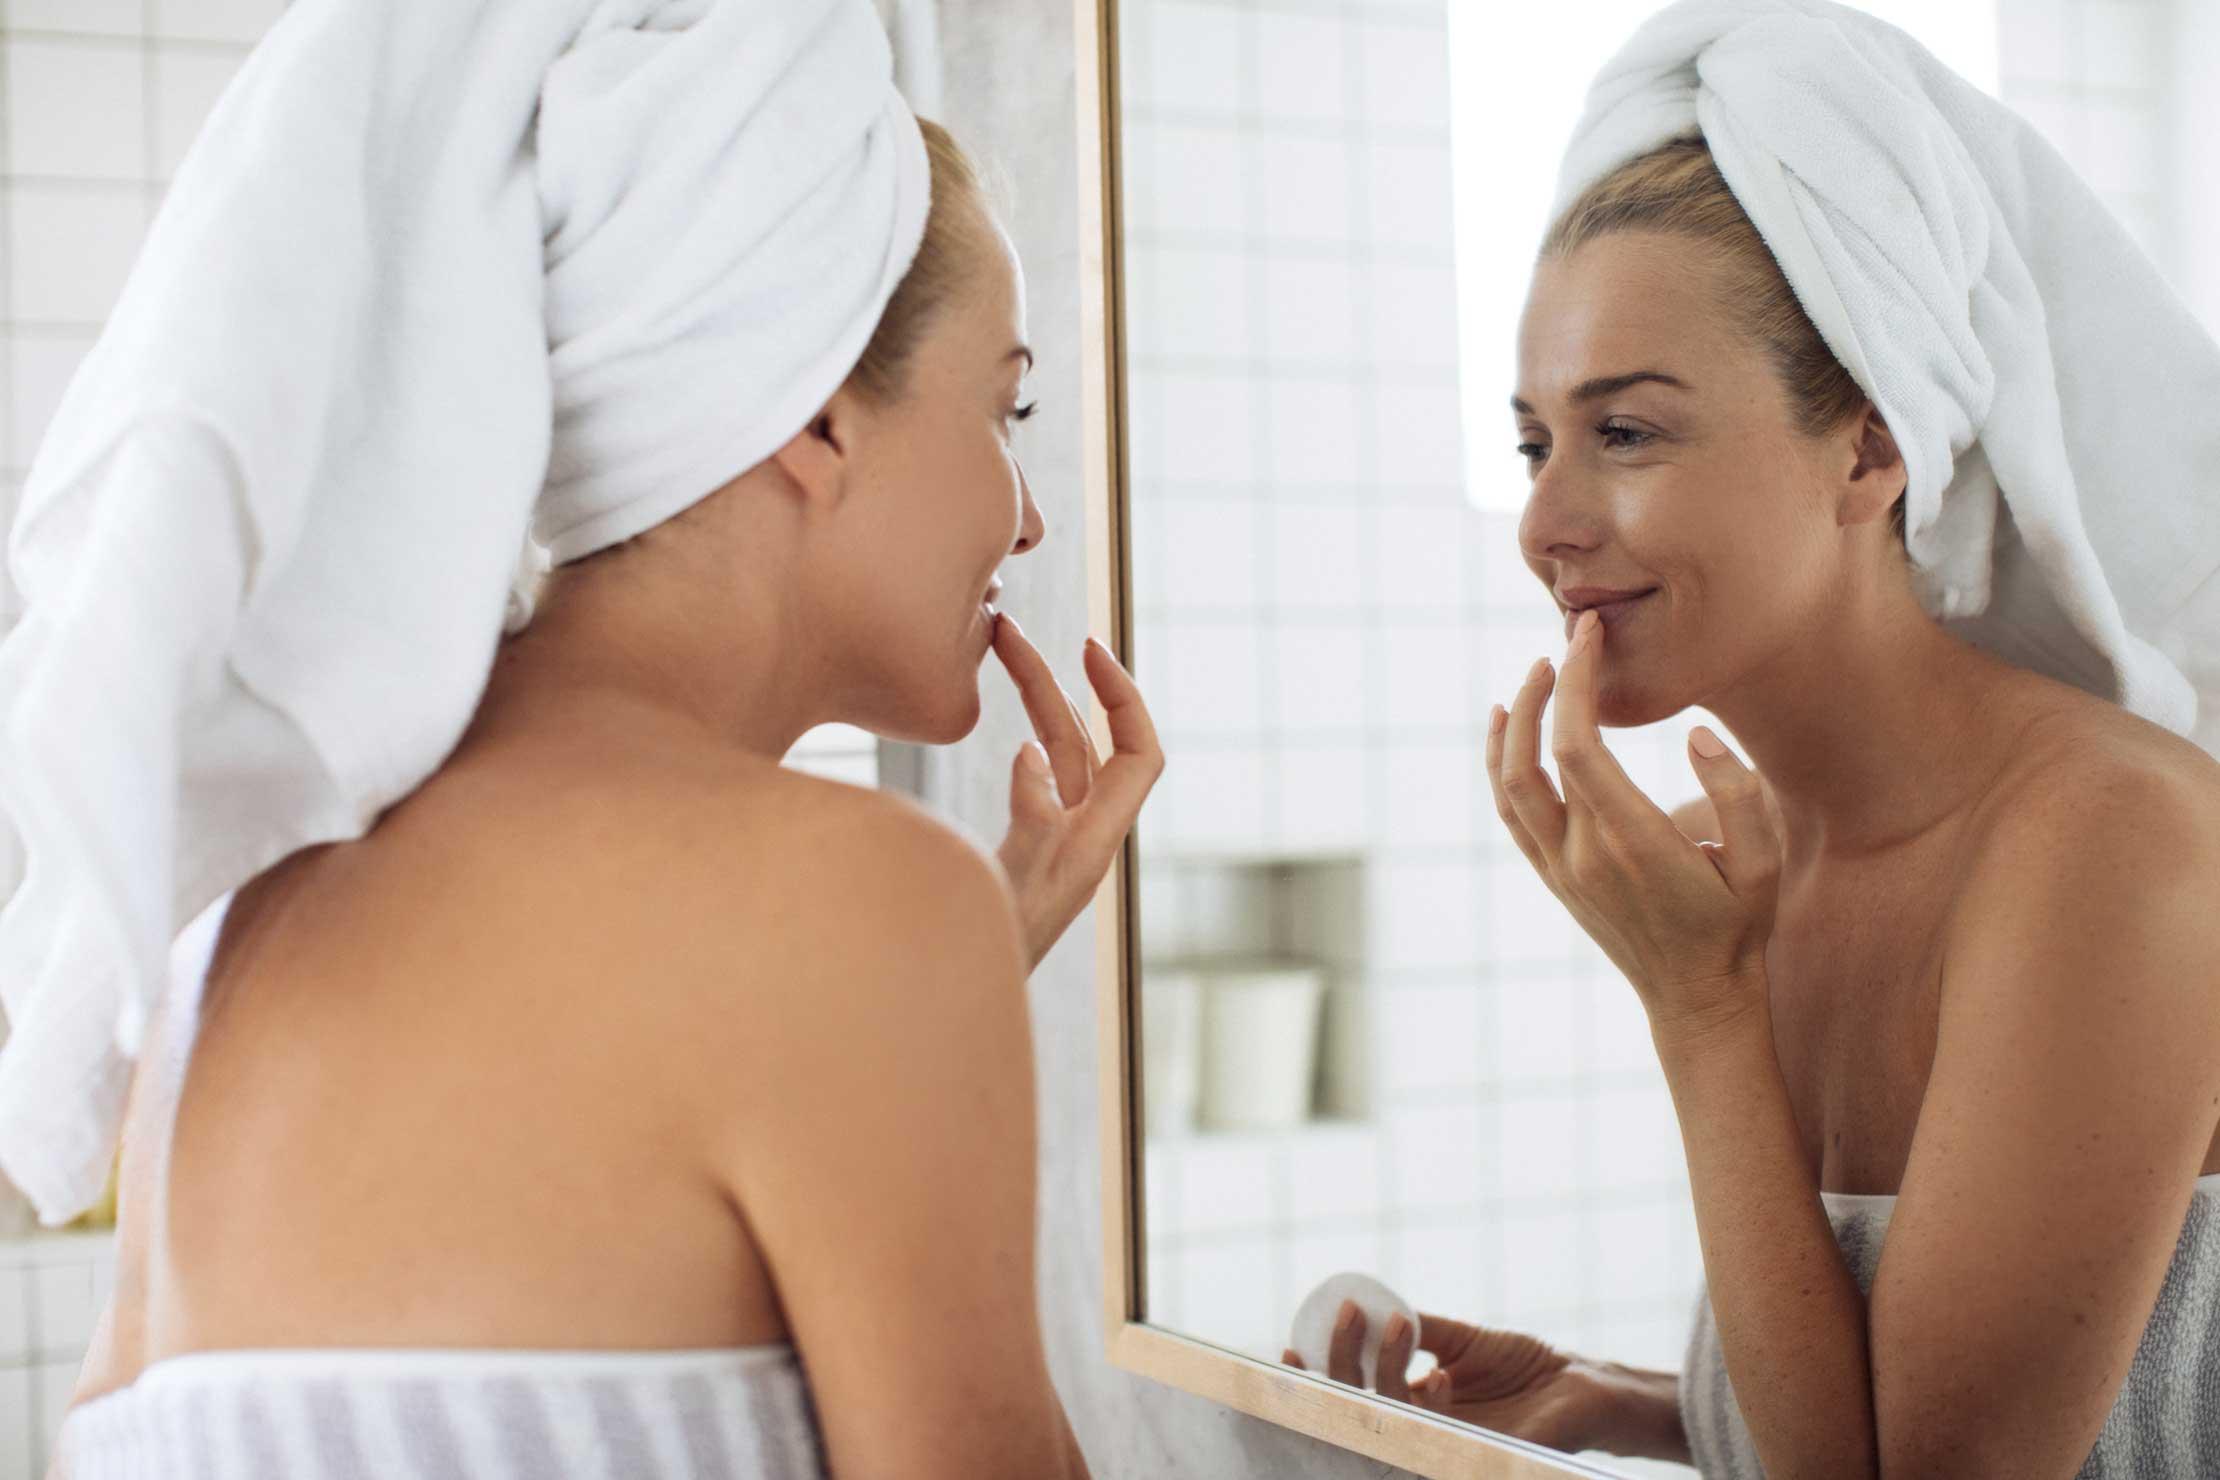 Frau mach sich vor Ihrem Badspiegel fertig